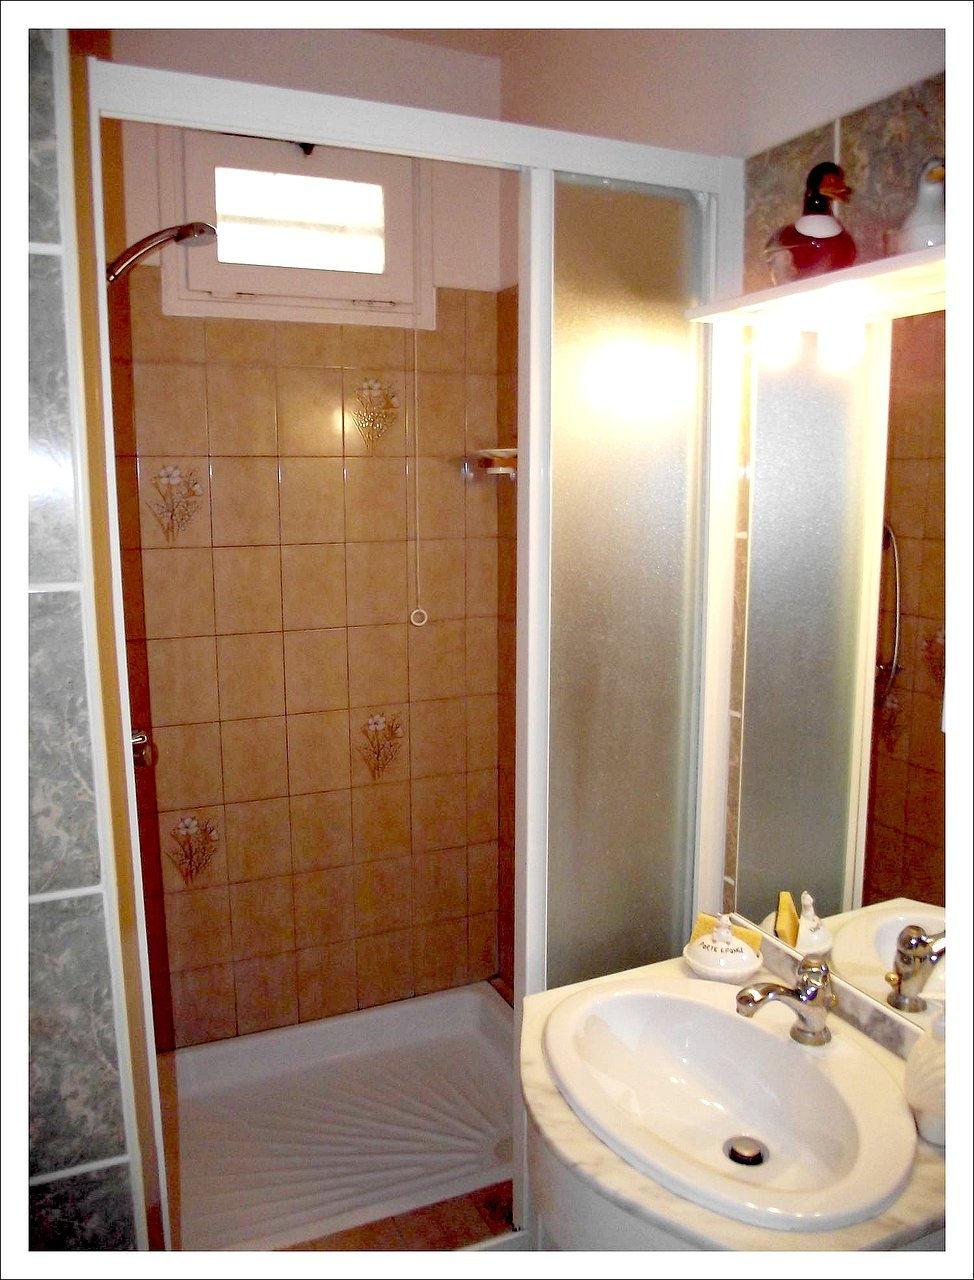 location port leucate appartement bord de mer dans l aude. Black Bedroom Furniture Sets. Home Design Ideas